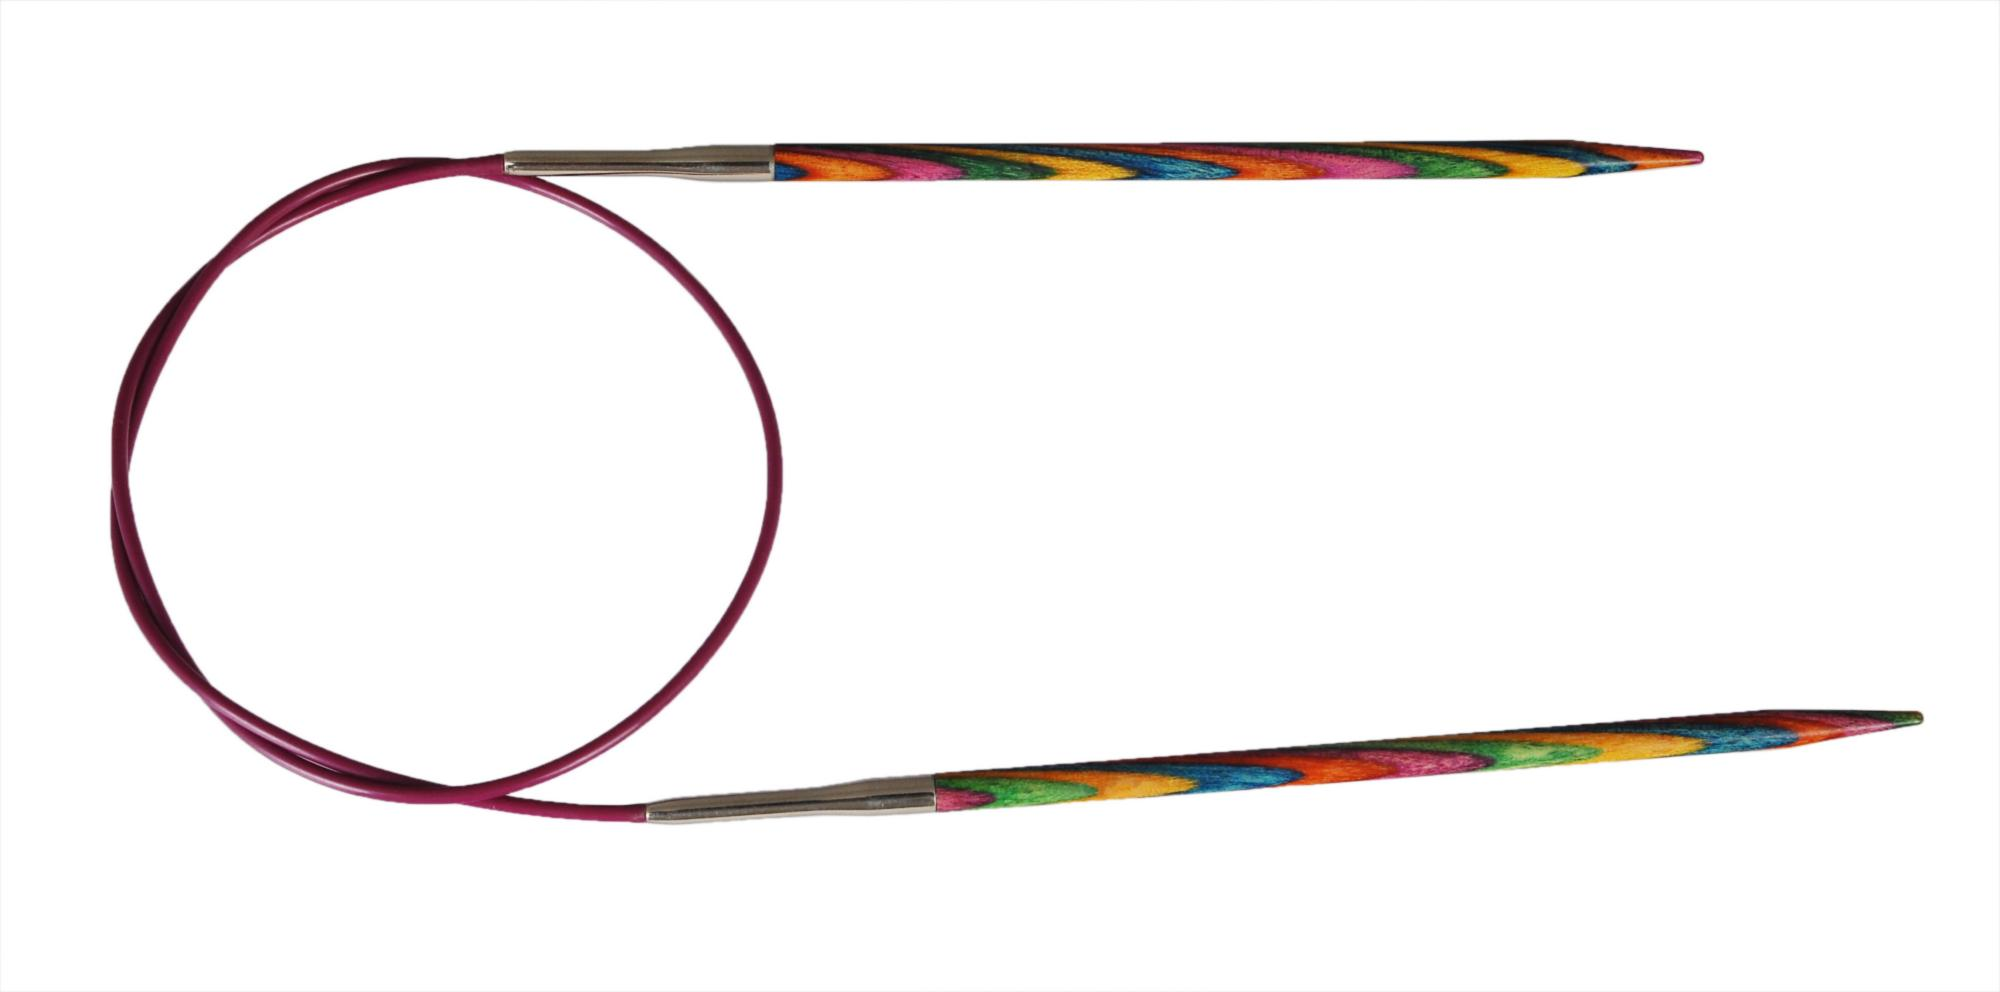 Спицы круговые 60 см Symfonie Wood KnitPro, 20324, 2.75 мм